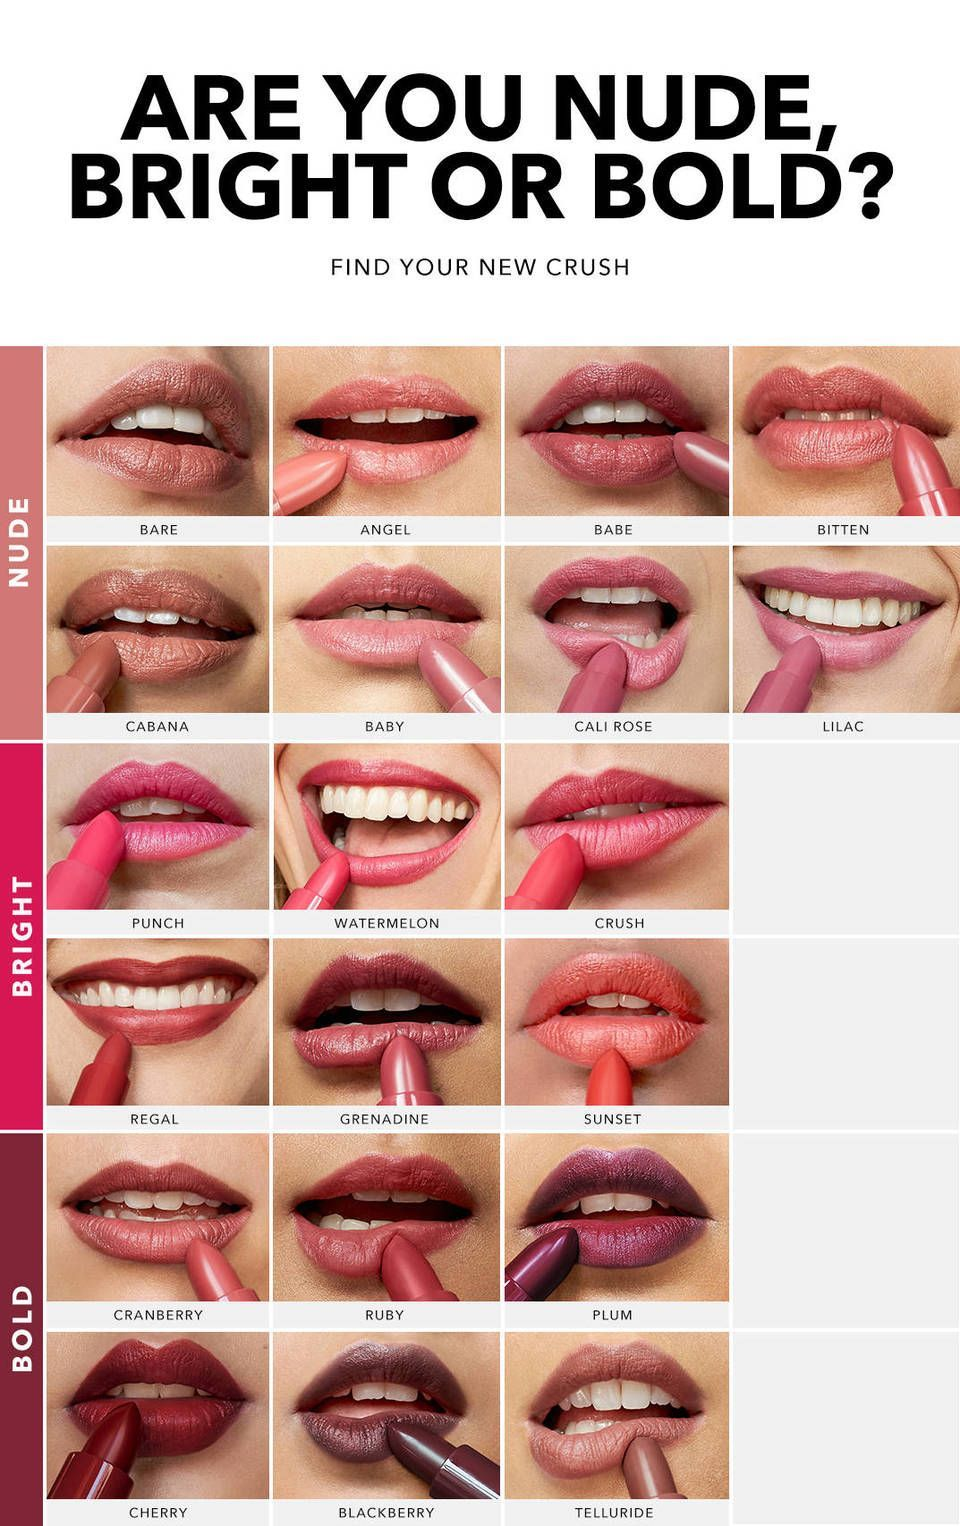 Pucker Up Lip Plumper by motives #12